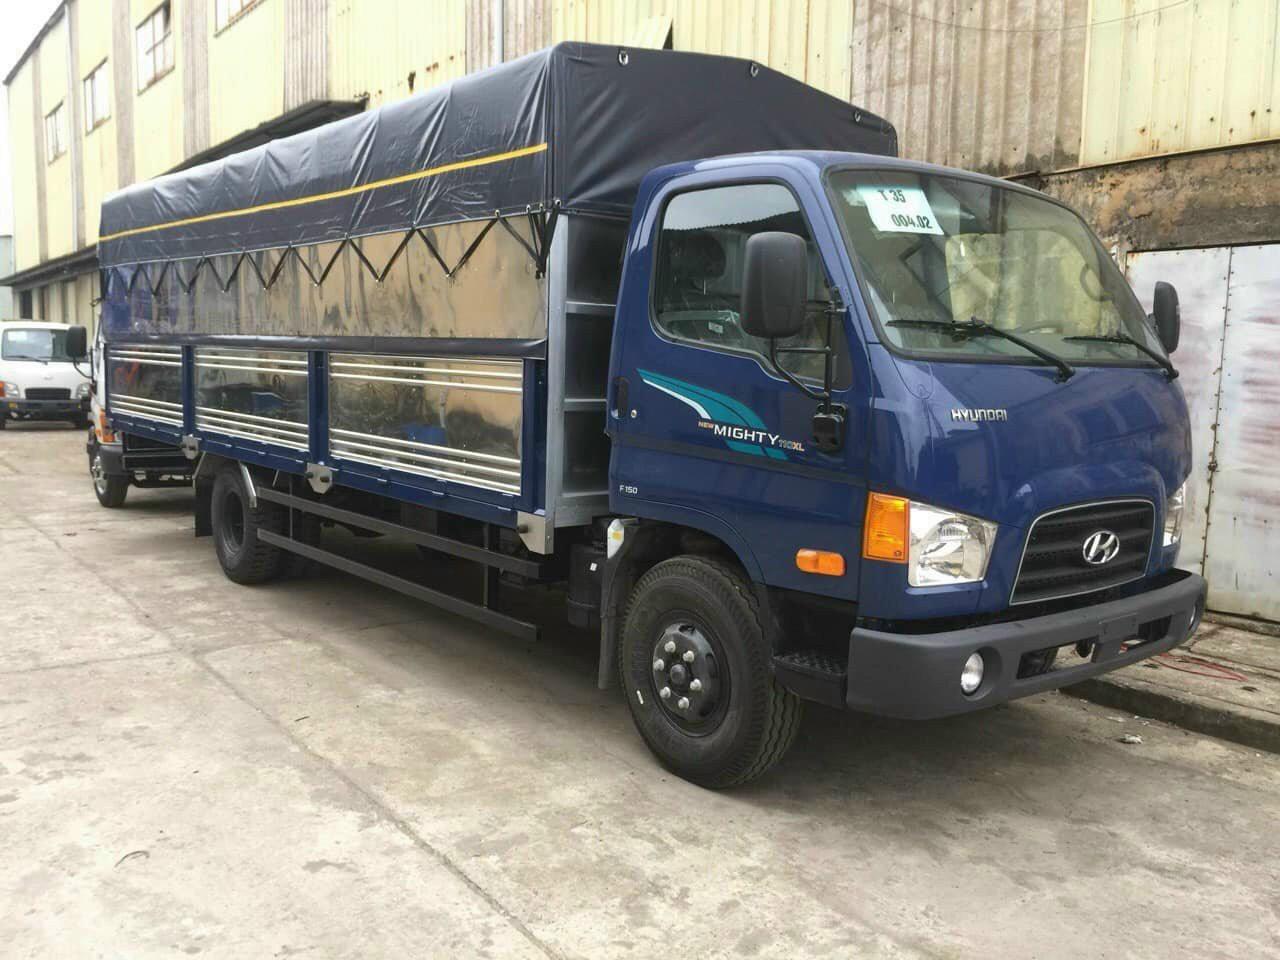 Bán xe tải Hyundai 110XL tại Lai Châu